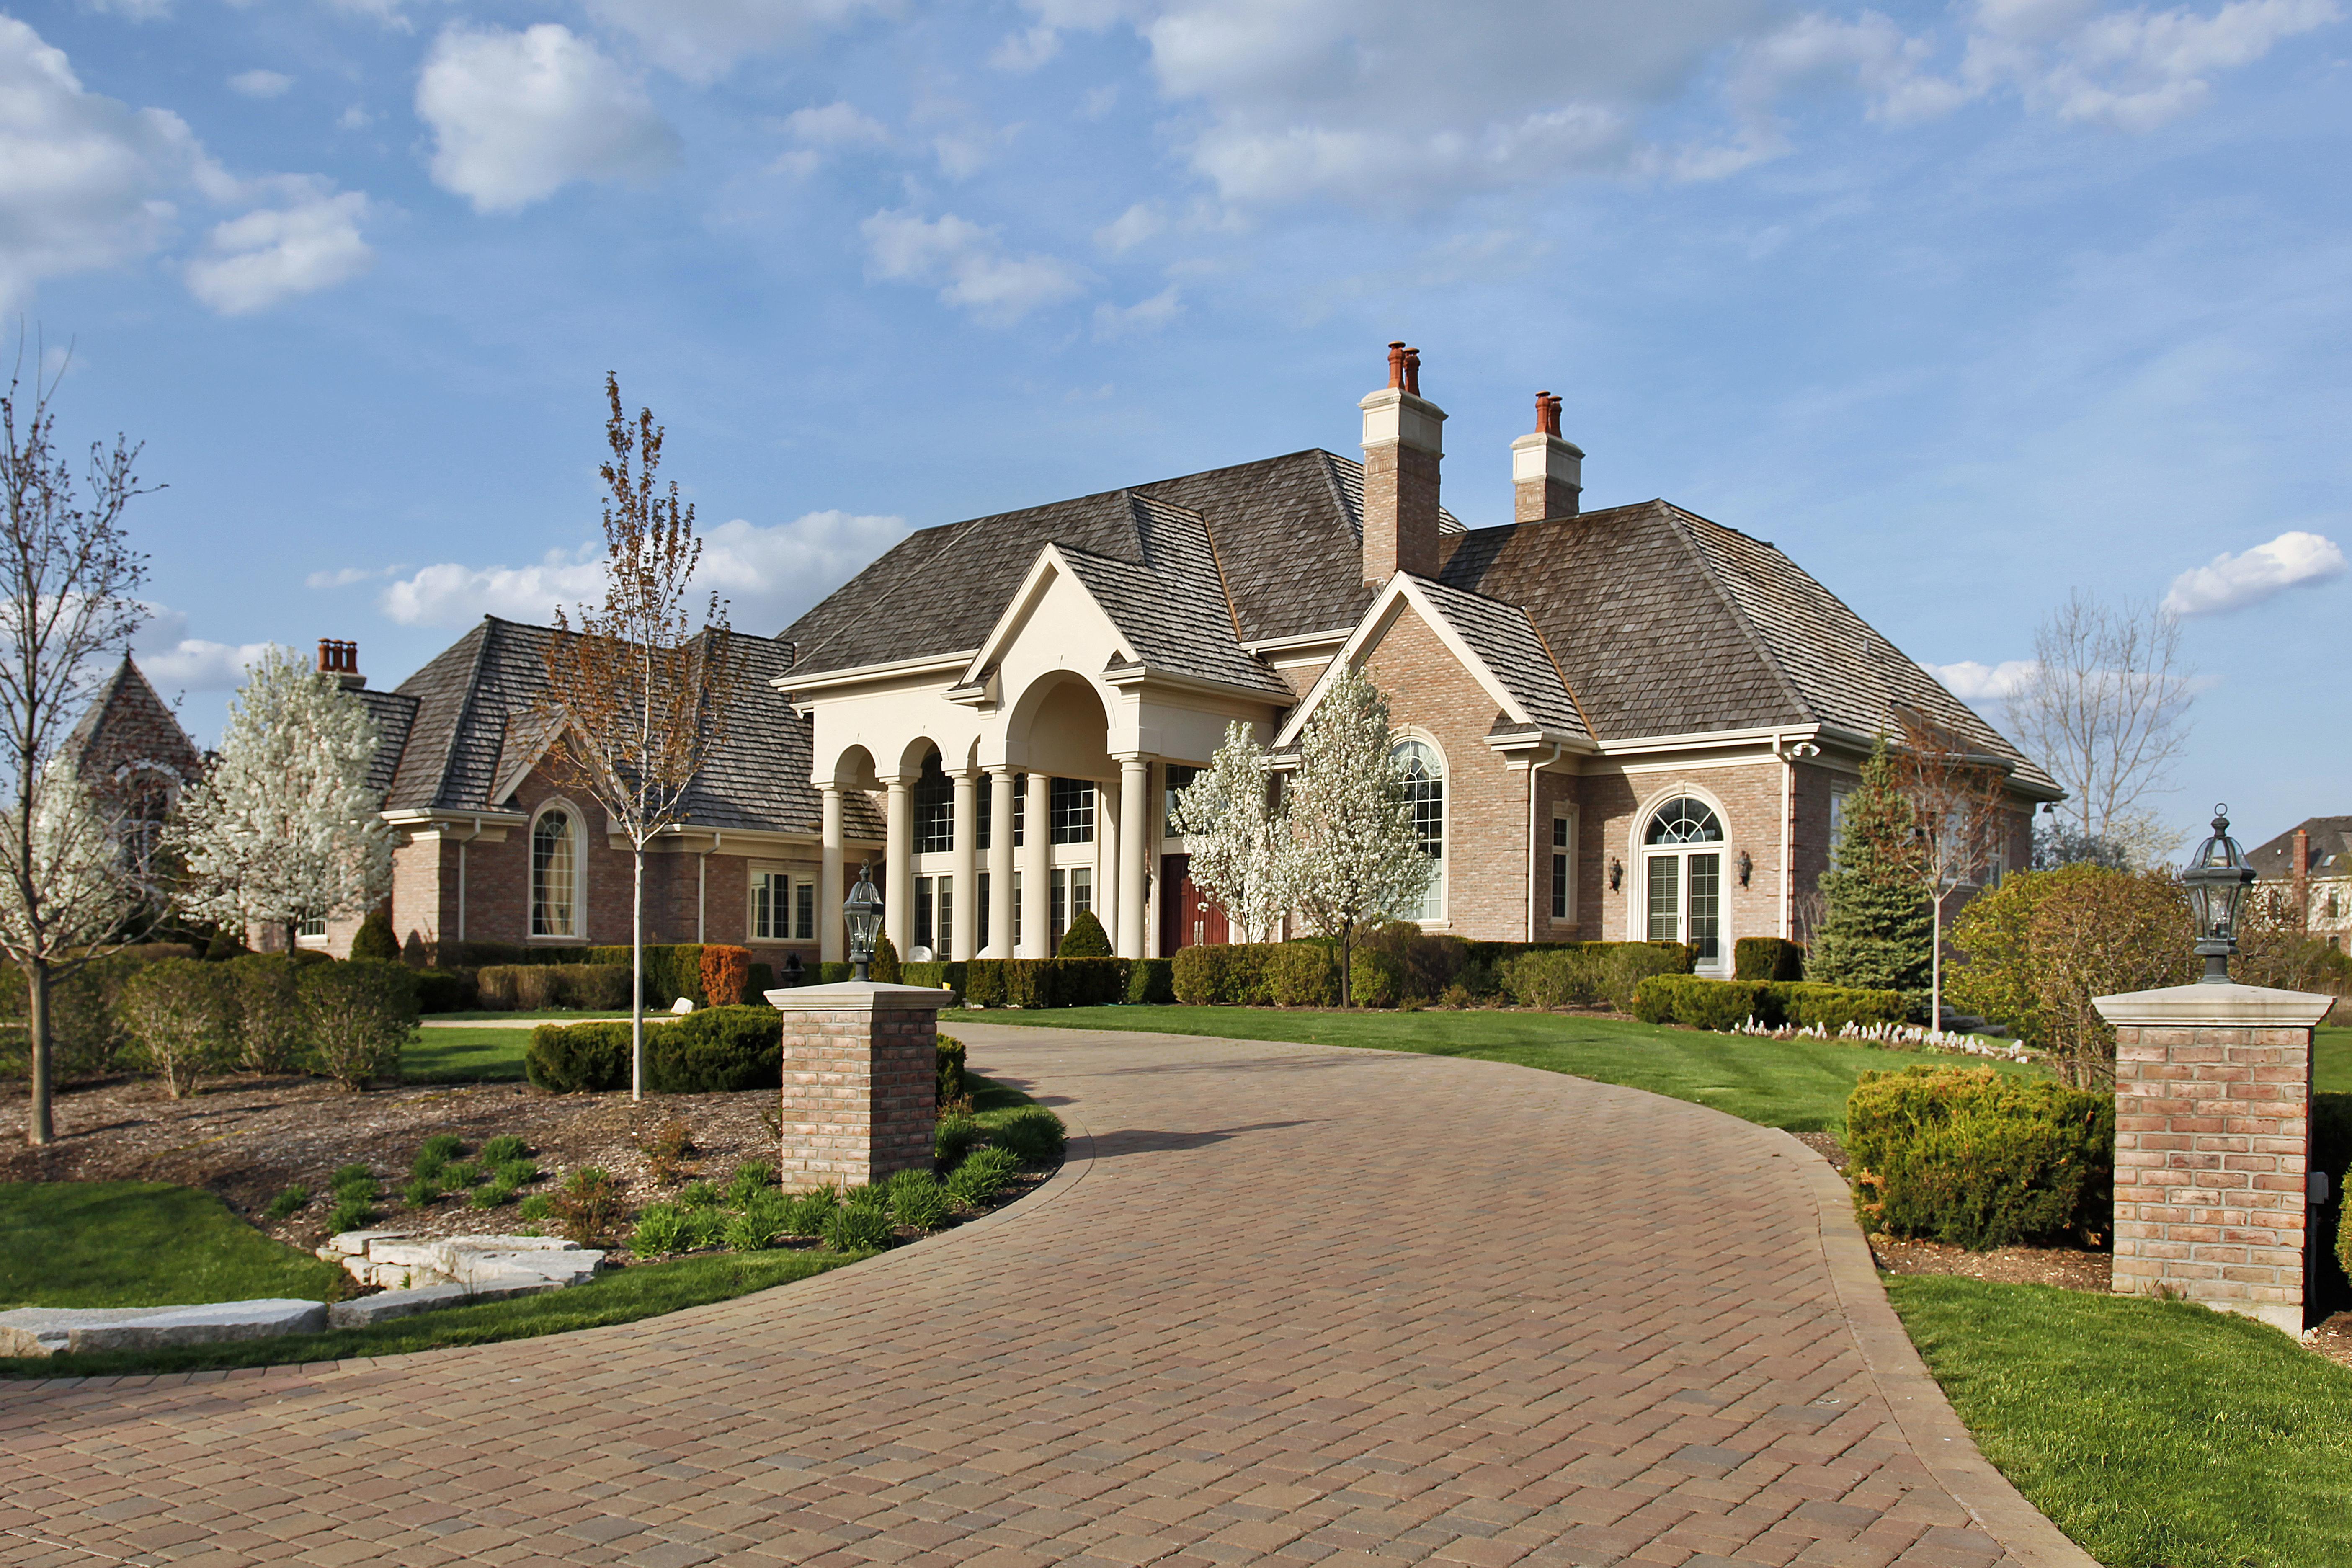 bigstock-Luxury-Home-With-Columns-5047228